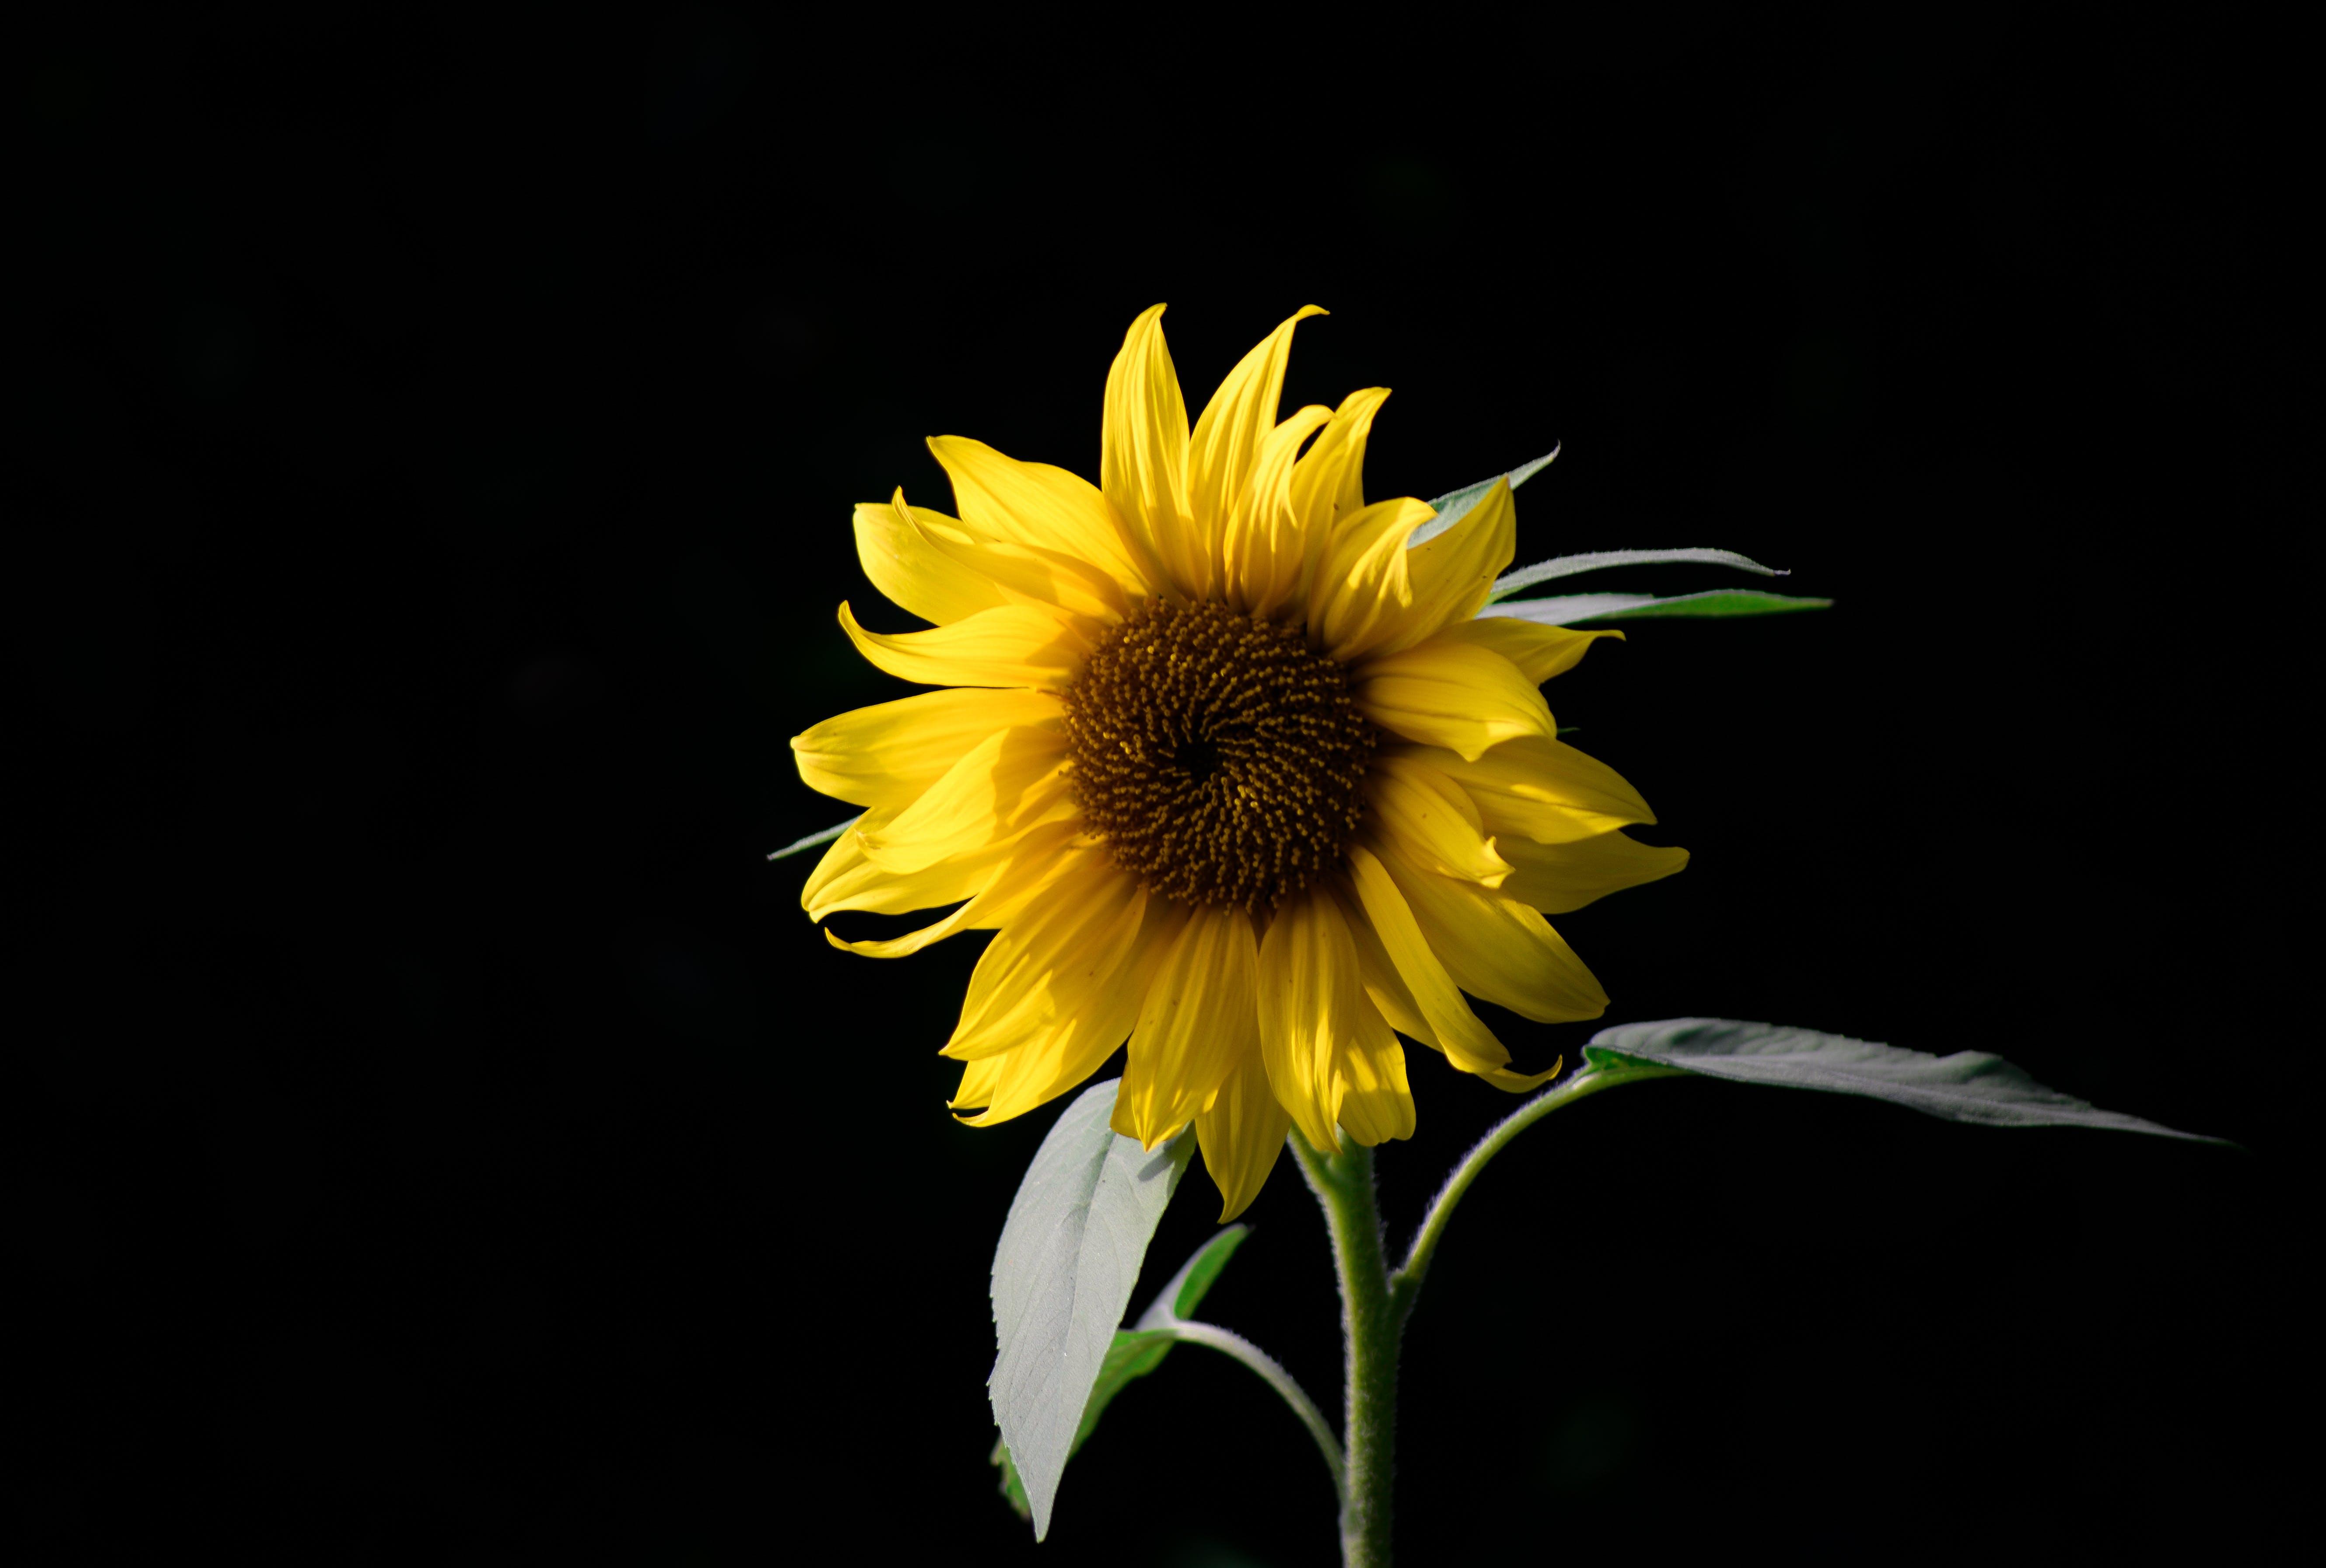 Free stock photo of nature, field, summer, sun